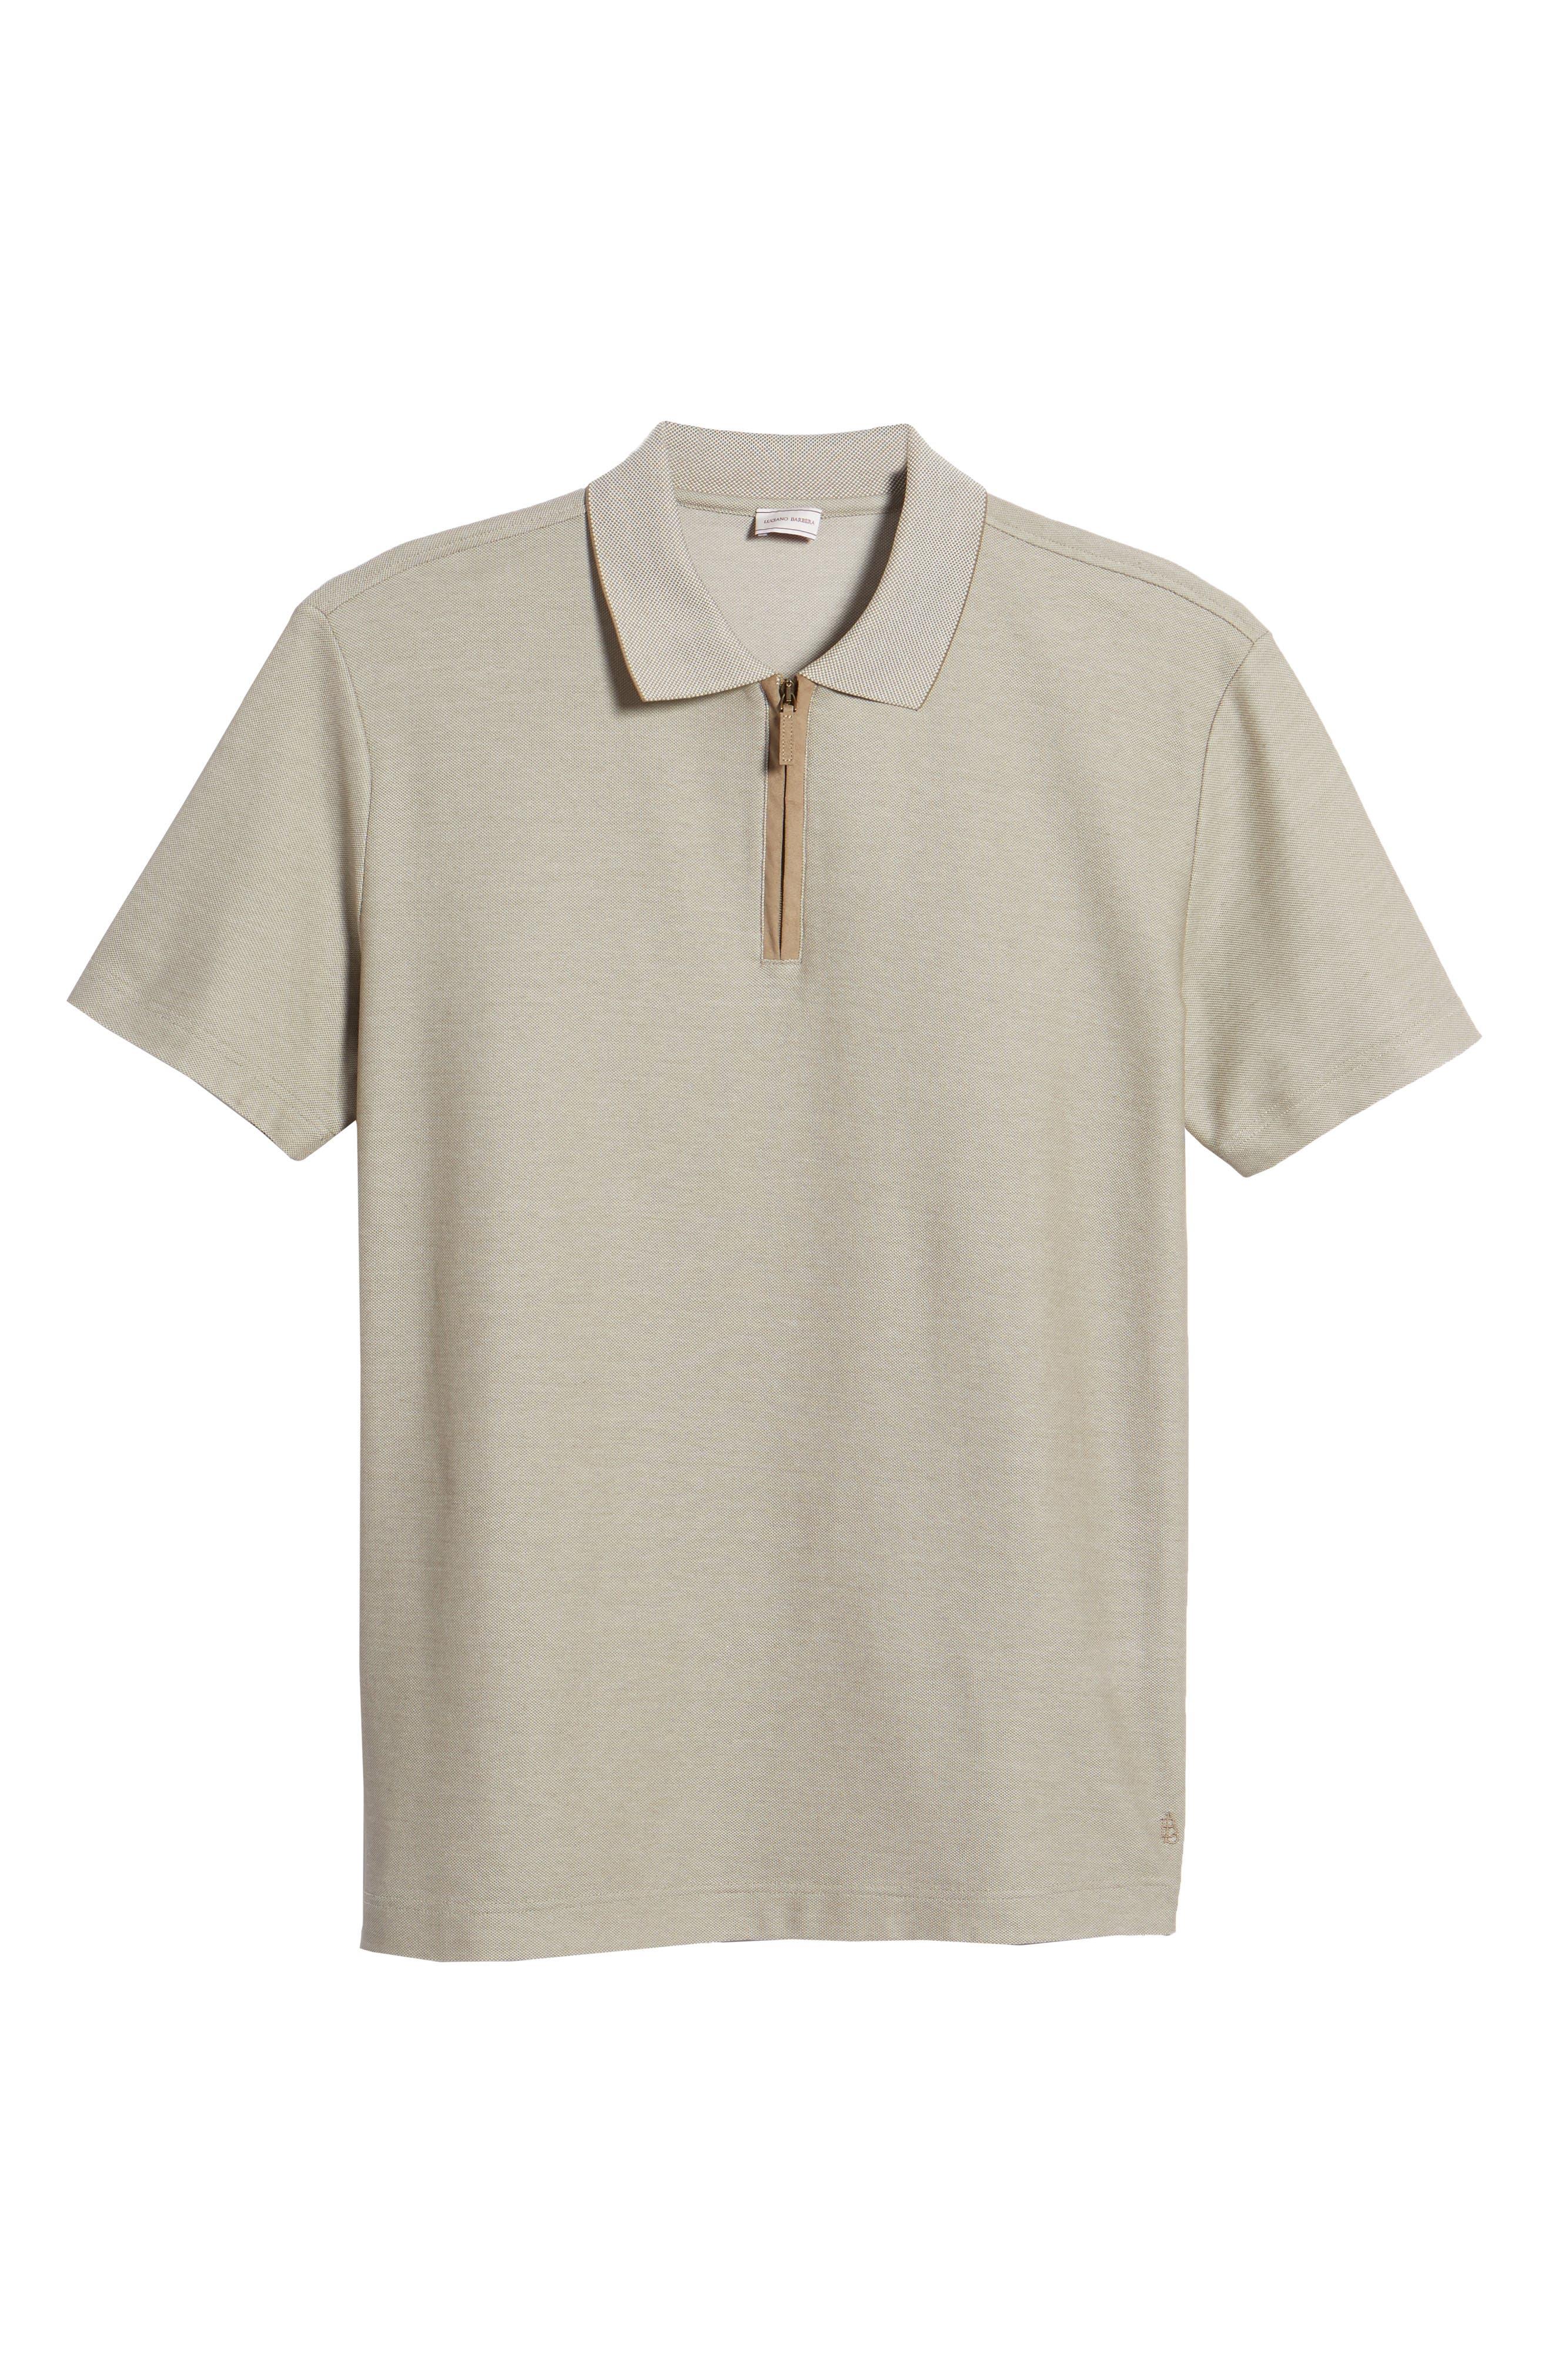 Cotton Polo Shirt,                             Alternate thumbnail 6, color,                             Tan